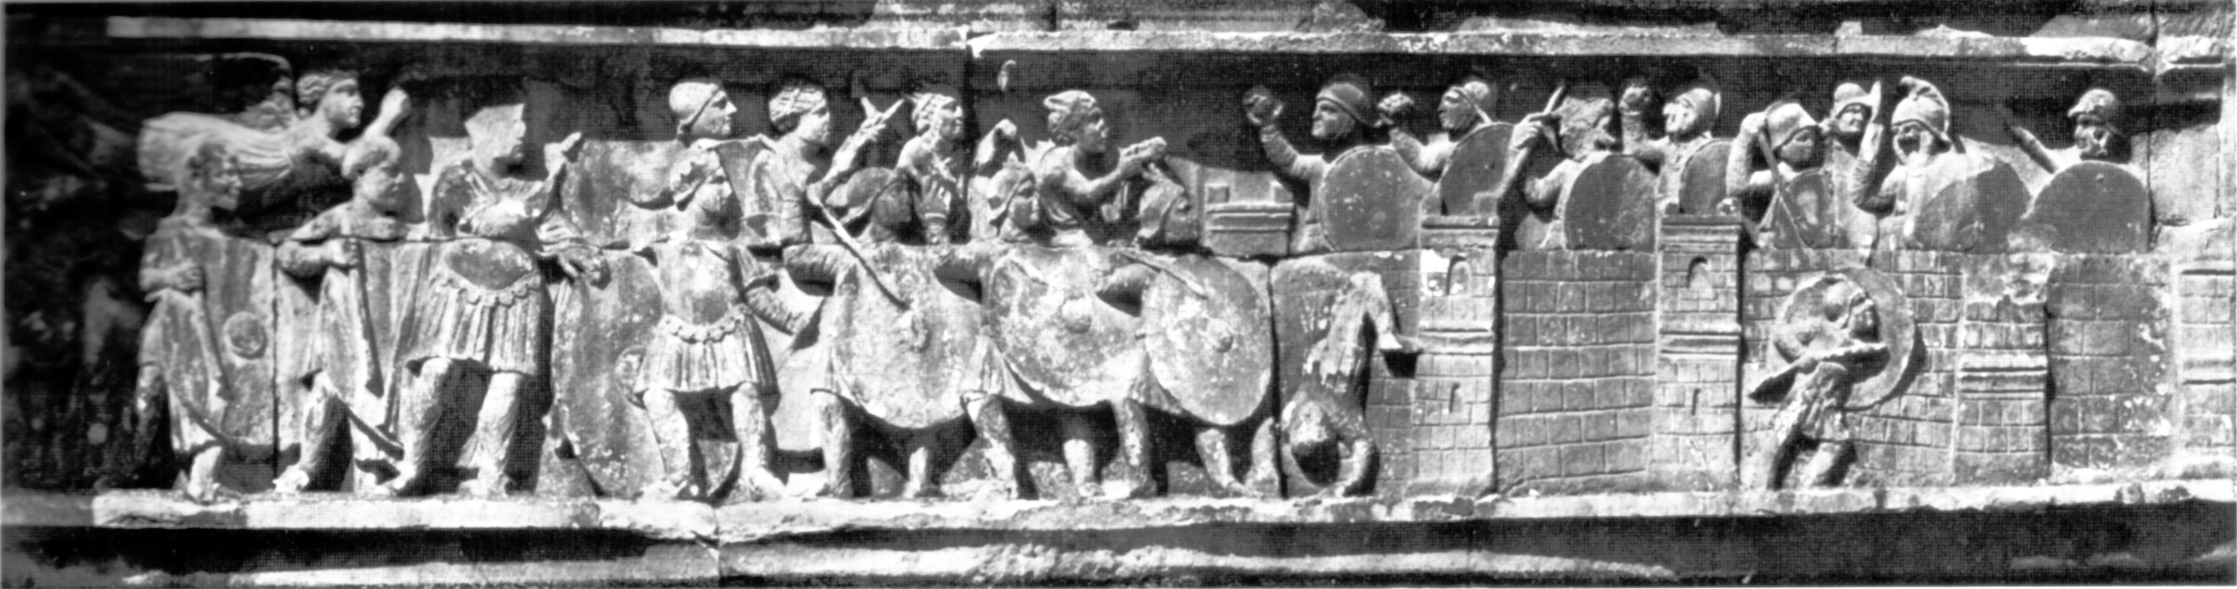 Arch of Constantine relief sculpture